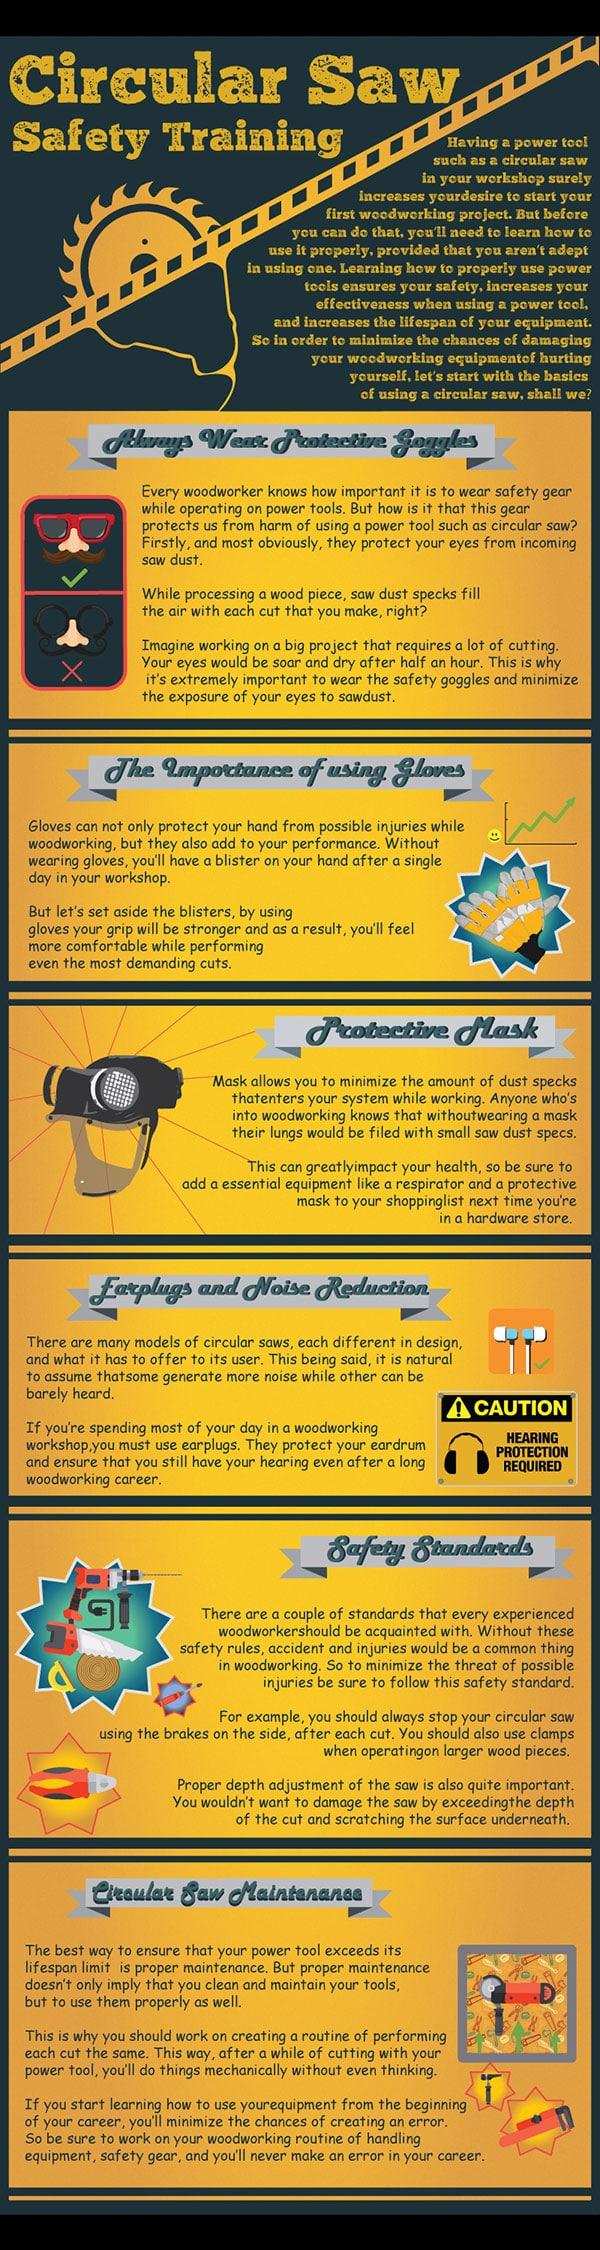 Circular Saw Safety Training